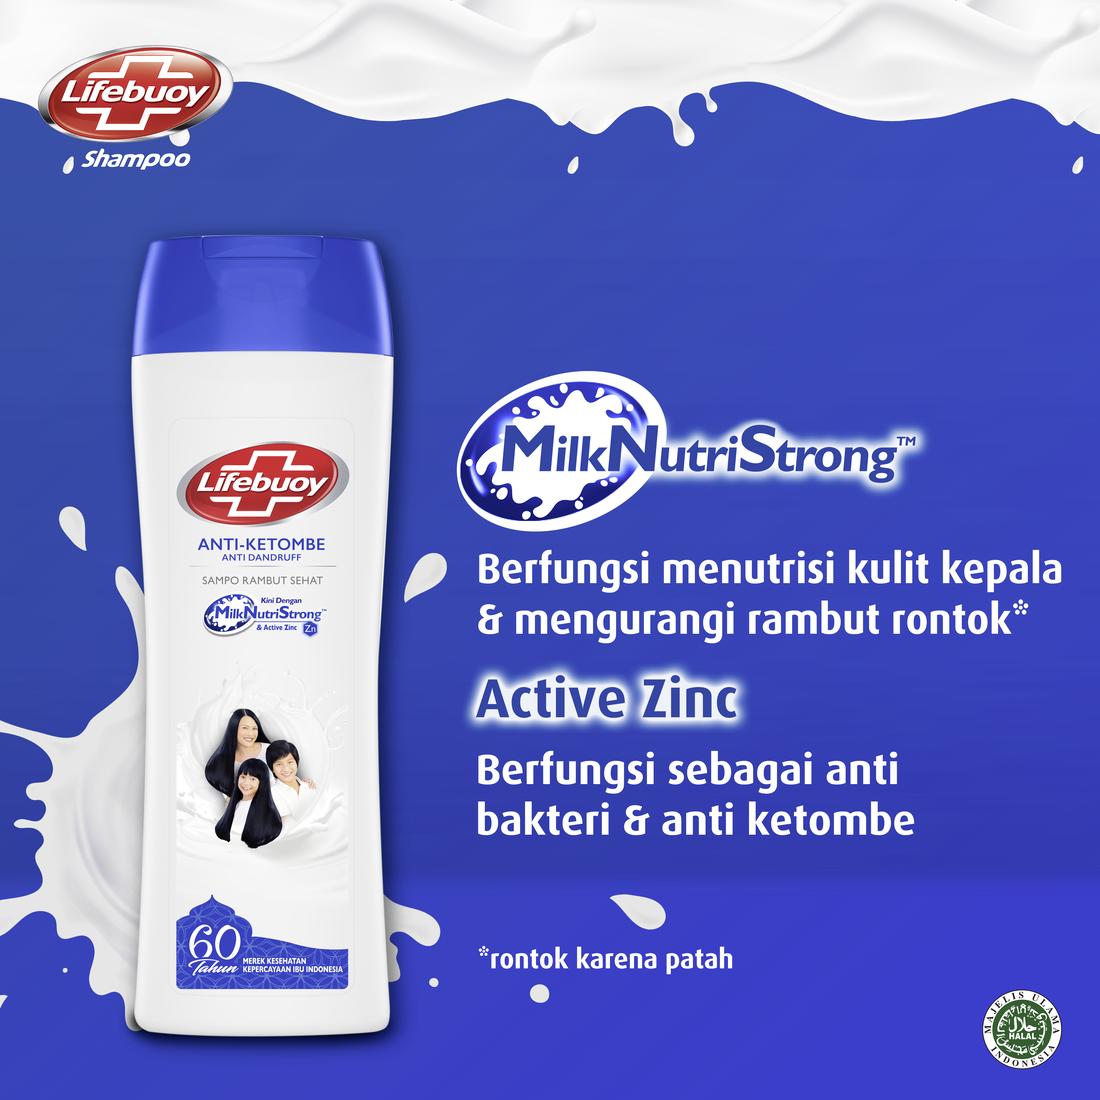 Lifebuoy Shampoo Anti Dandruff 170ml Twin Pack-6